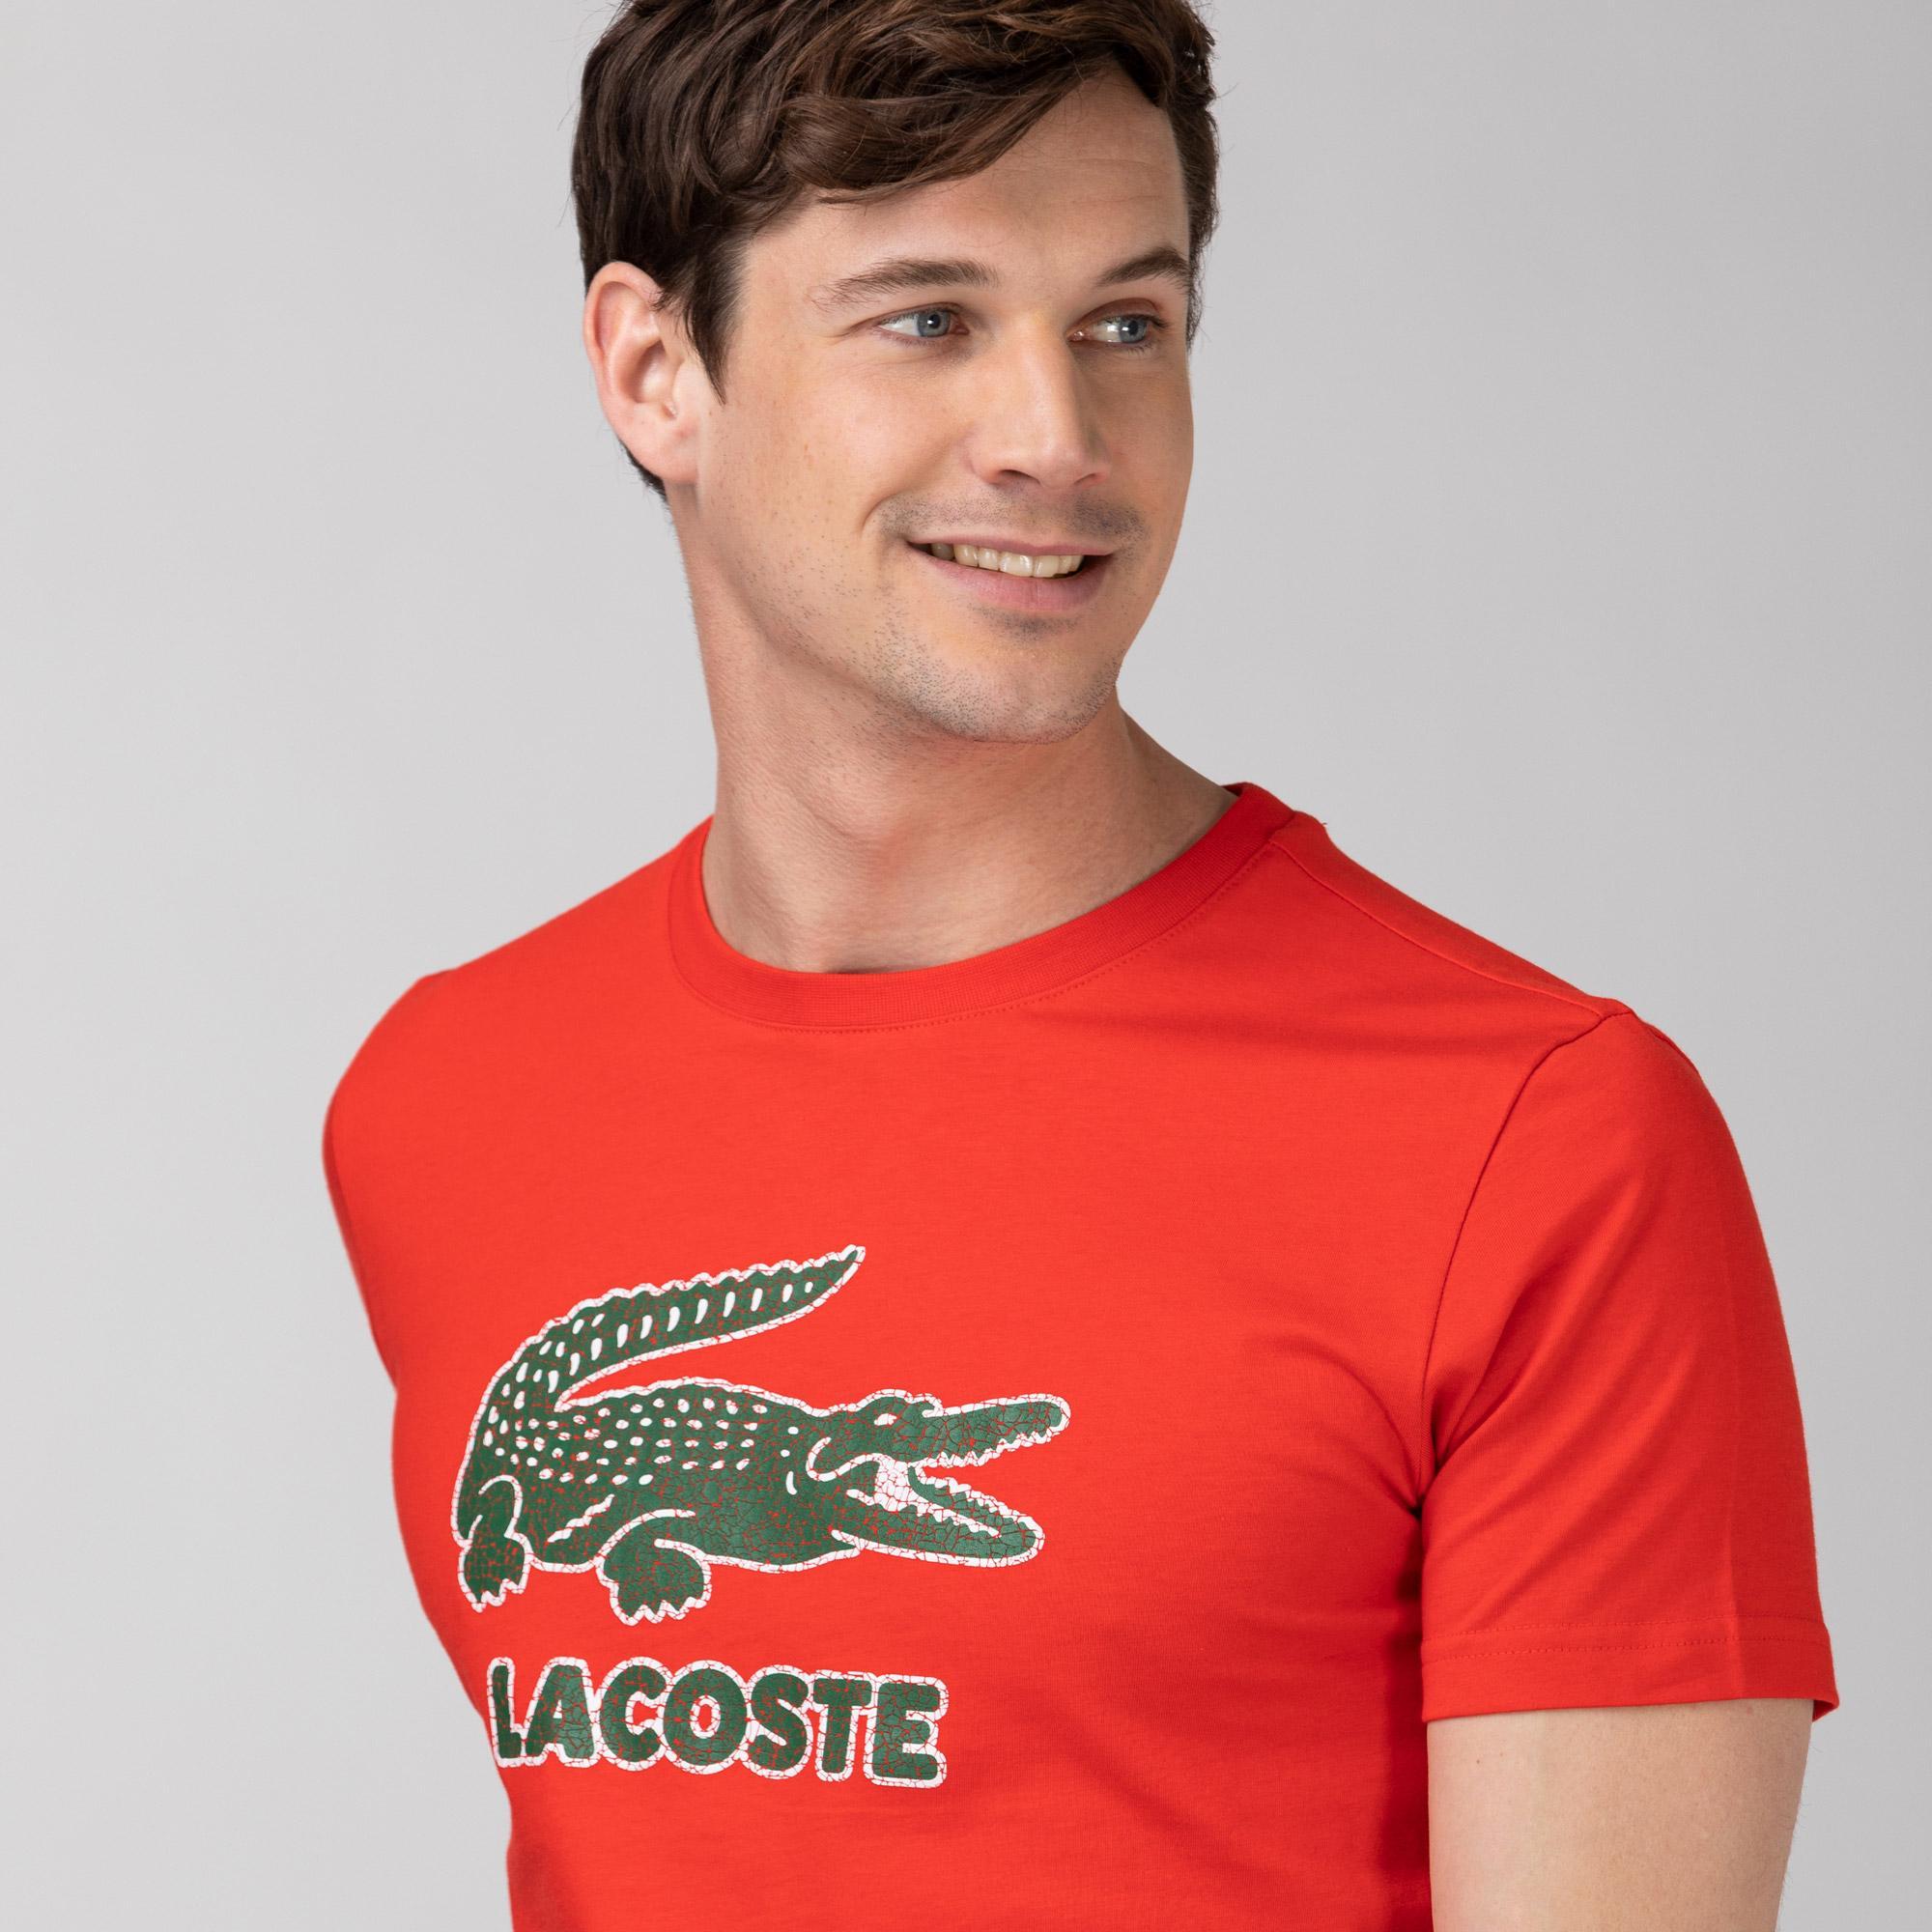 Lacoste Erkek Regular Fit Bisiklet Yaka Baskılı Kırmızı T-Shirt